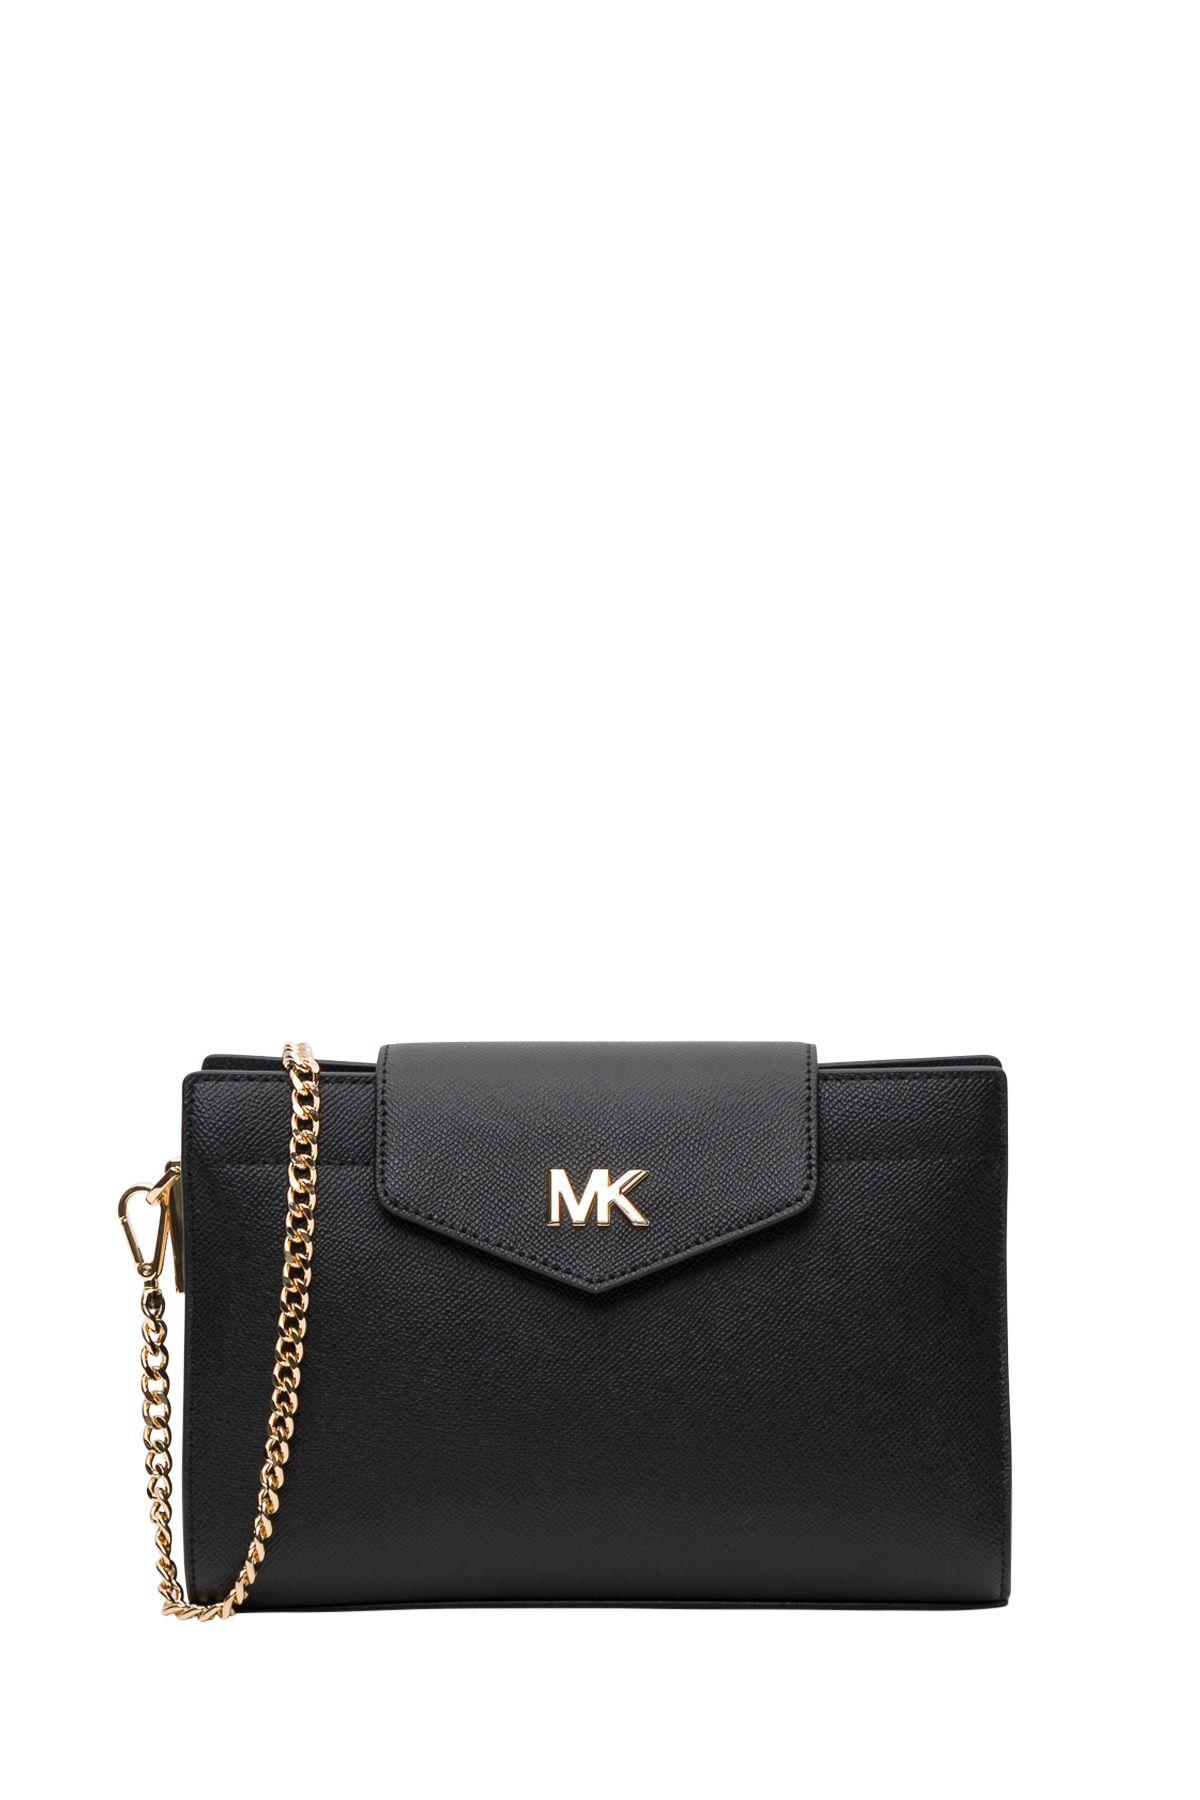 b614cd107aec MICHAEL Michael Kors Grossgrain Leather Crossbody Bag - Black ...